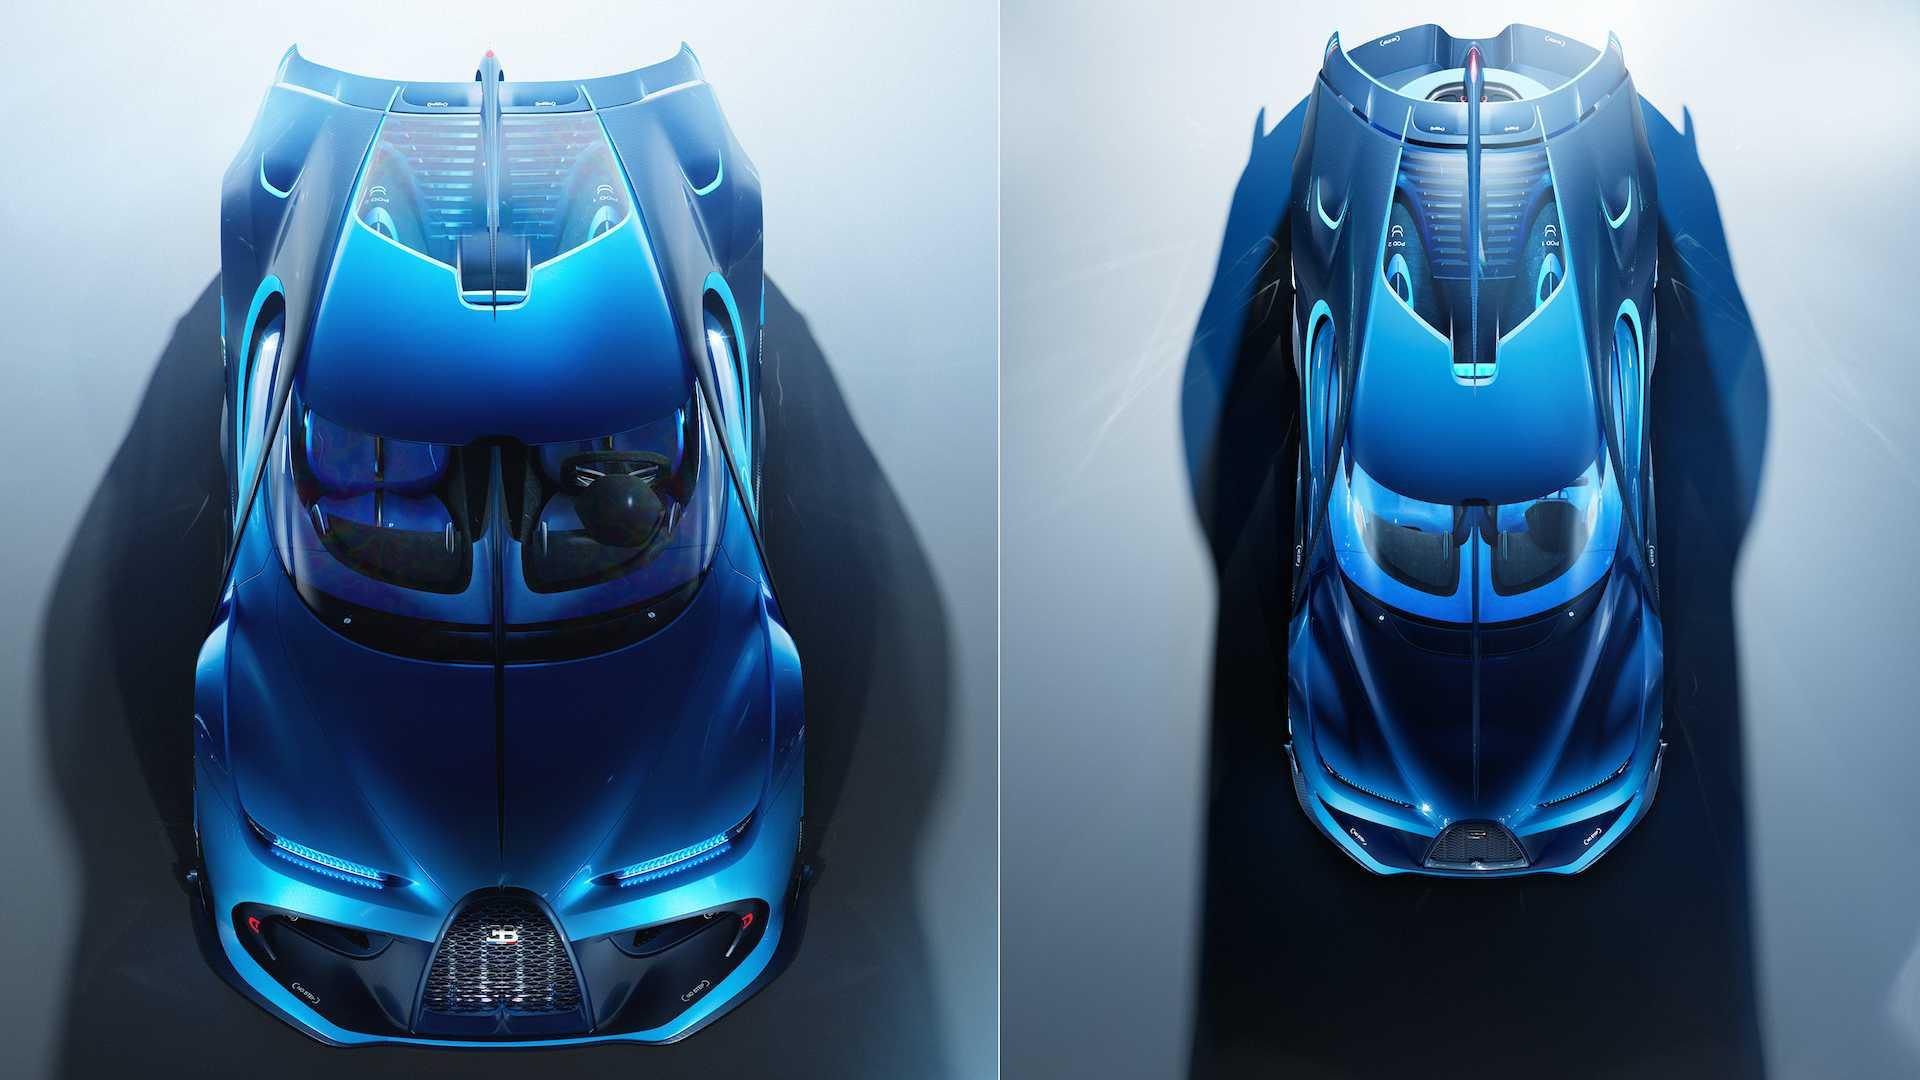 bugatti-type-103-rendering1.jpg